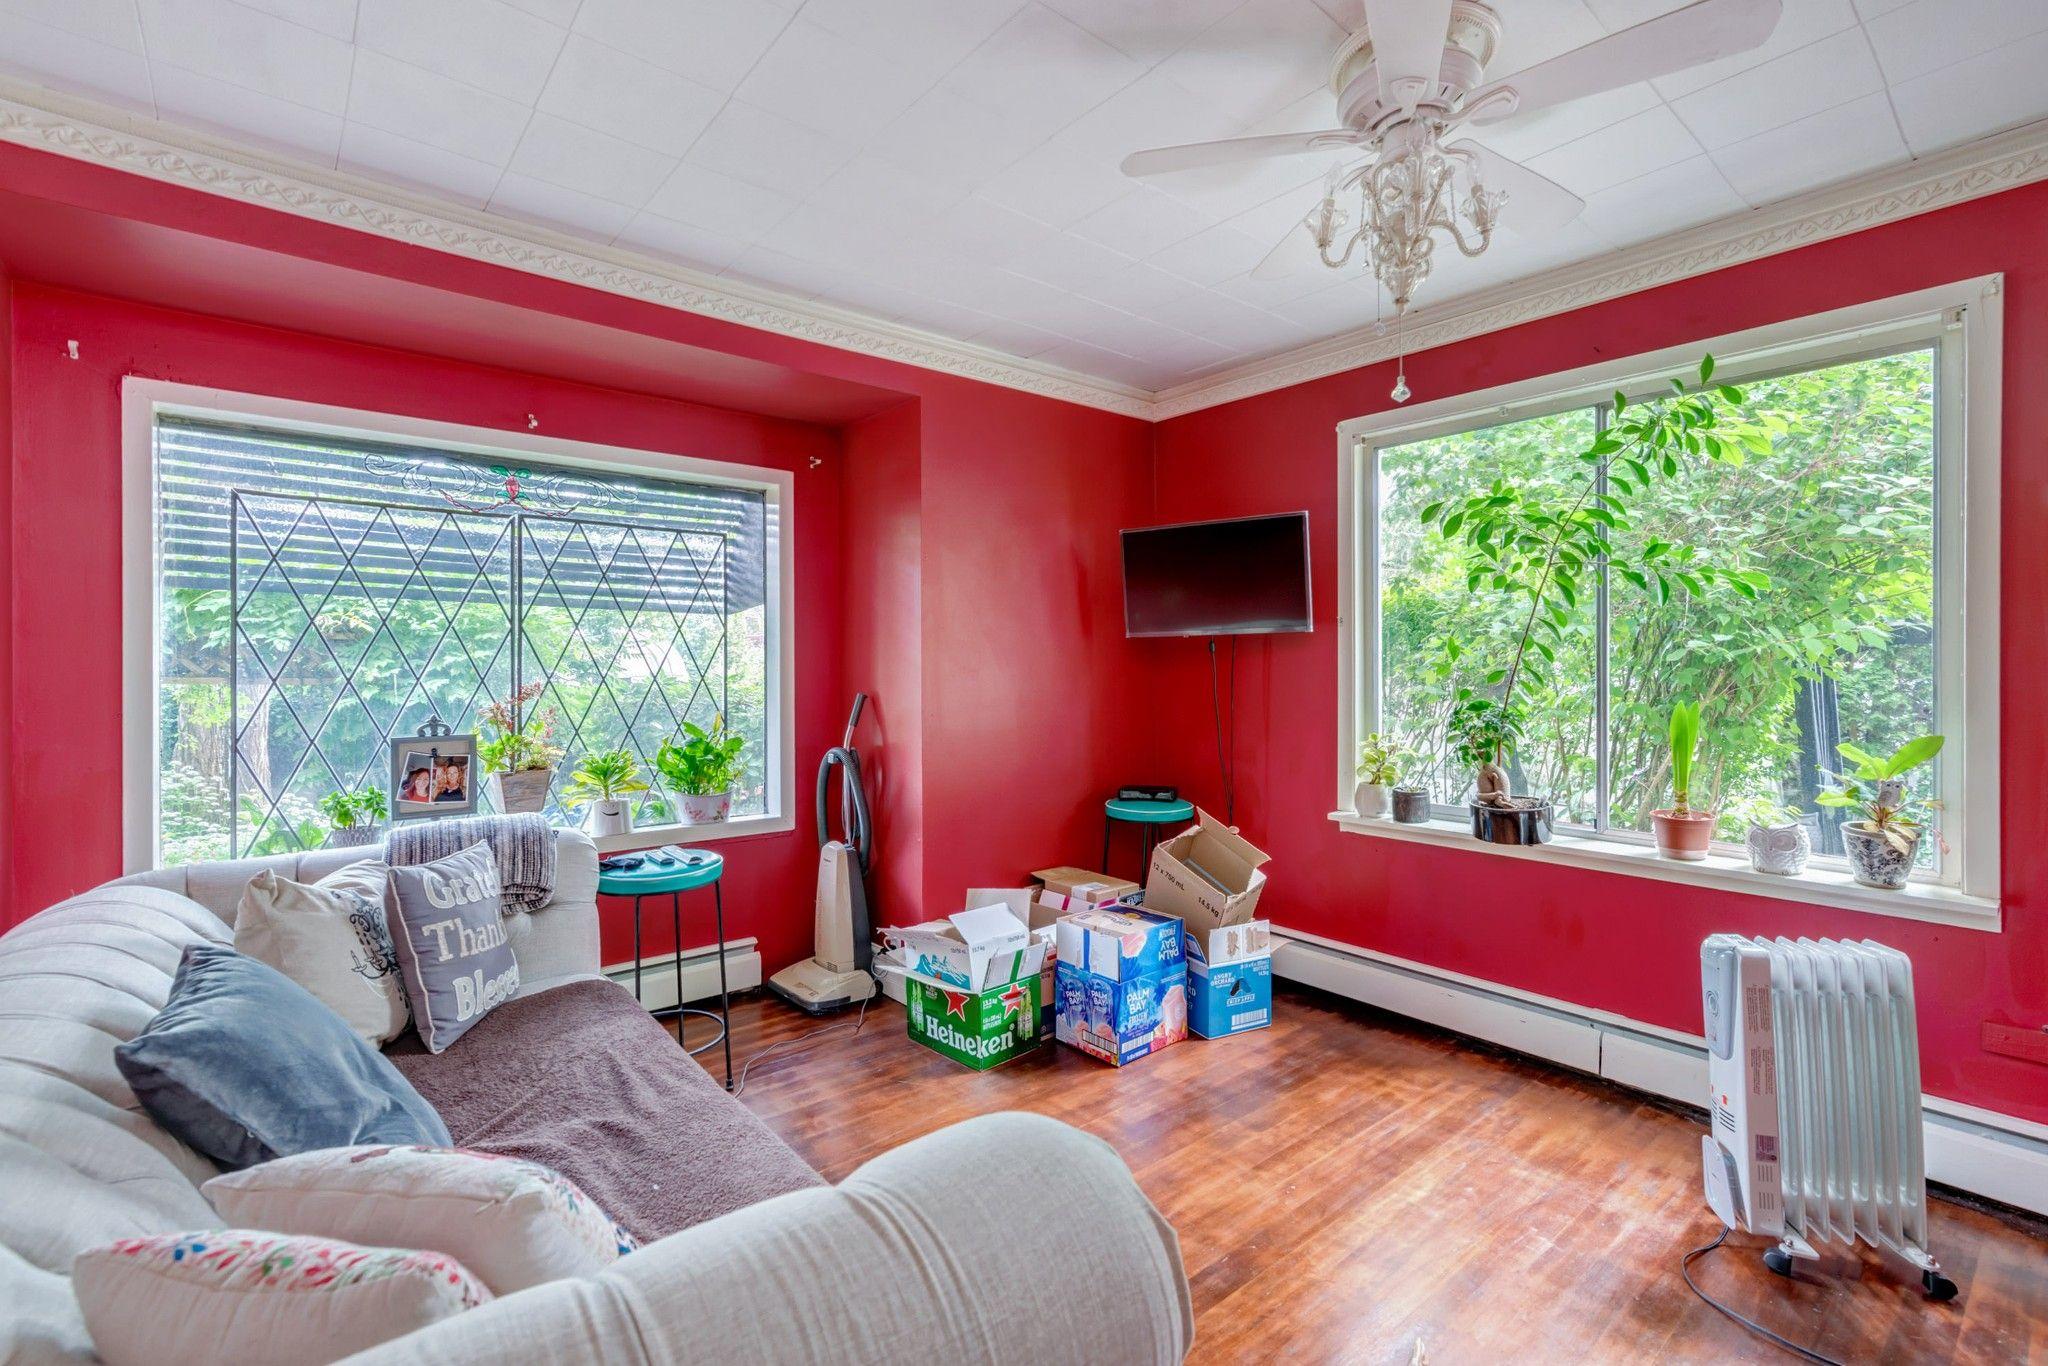 Photo 8: Photos: 20623 114 Avenue in Maple Ridge: Southwest Maple Ridge House for sale : MLS®# R2465656